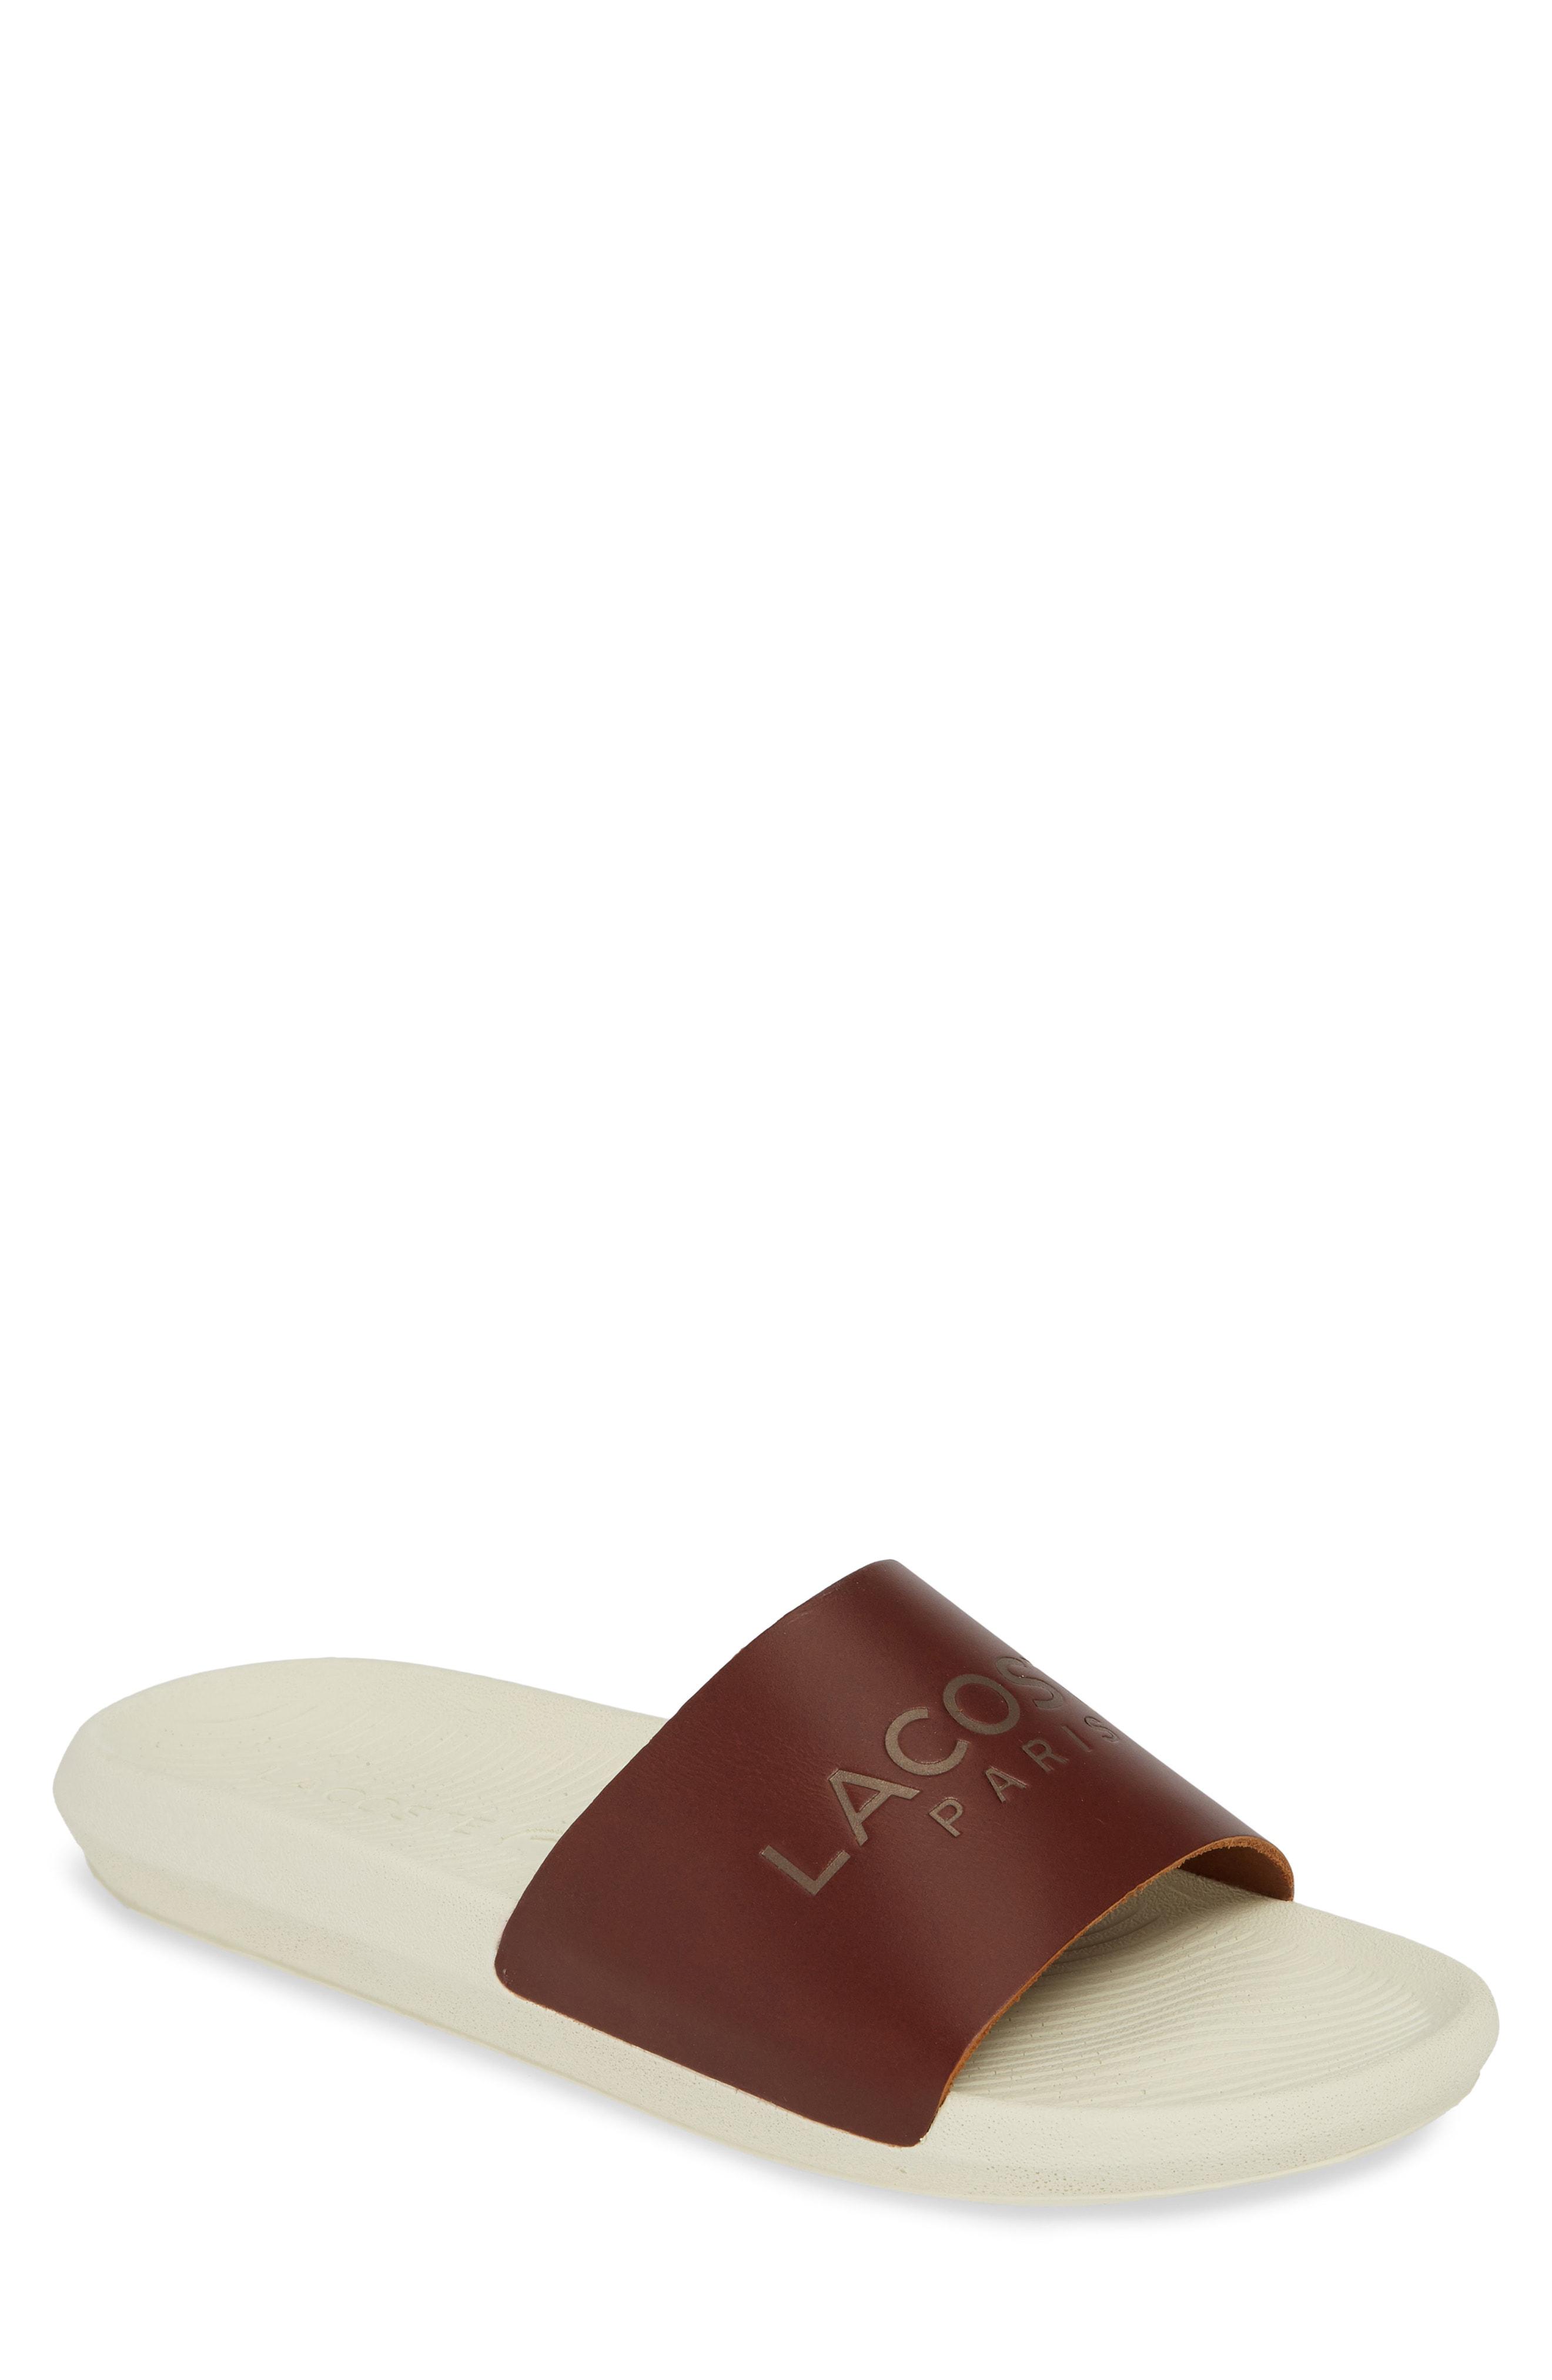 abba10355 Lacoste Croco Slide Sandal In Tan  Off White